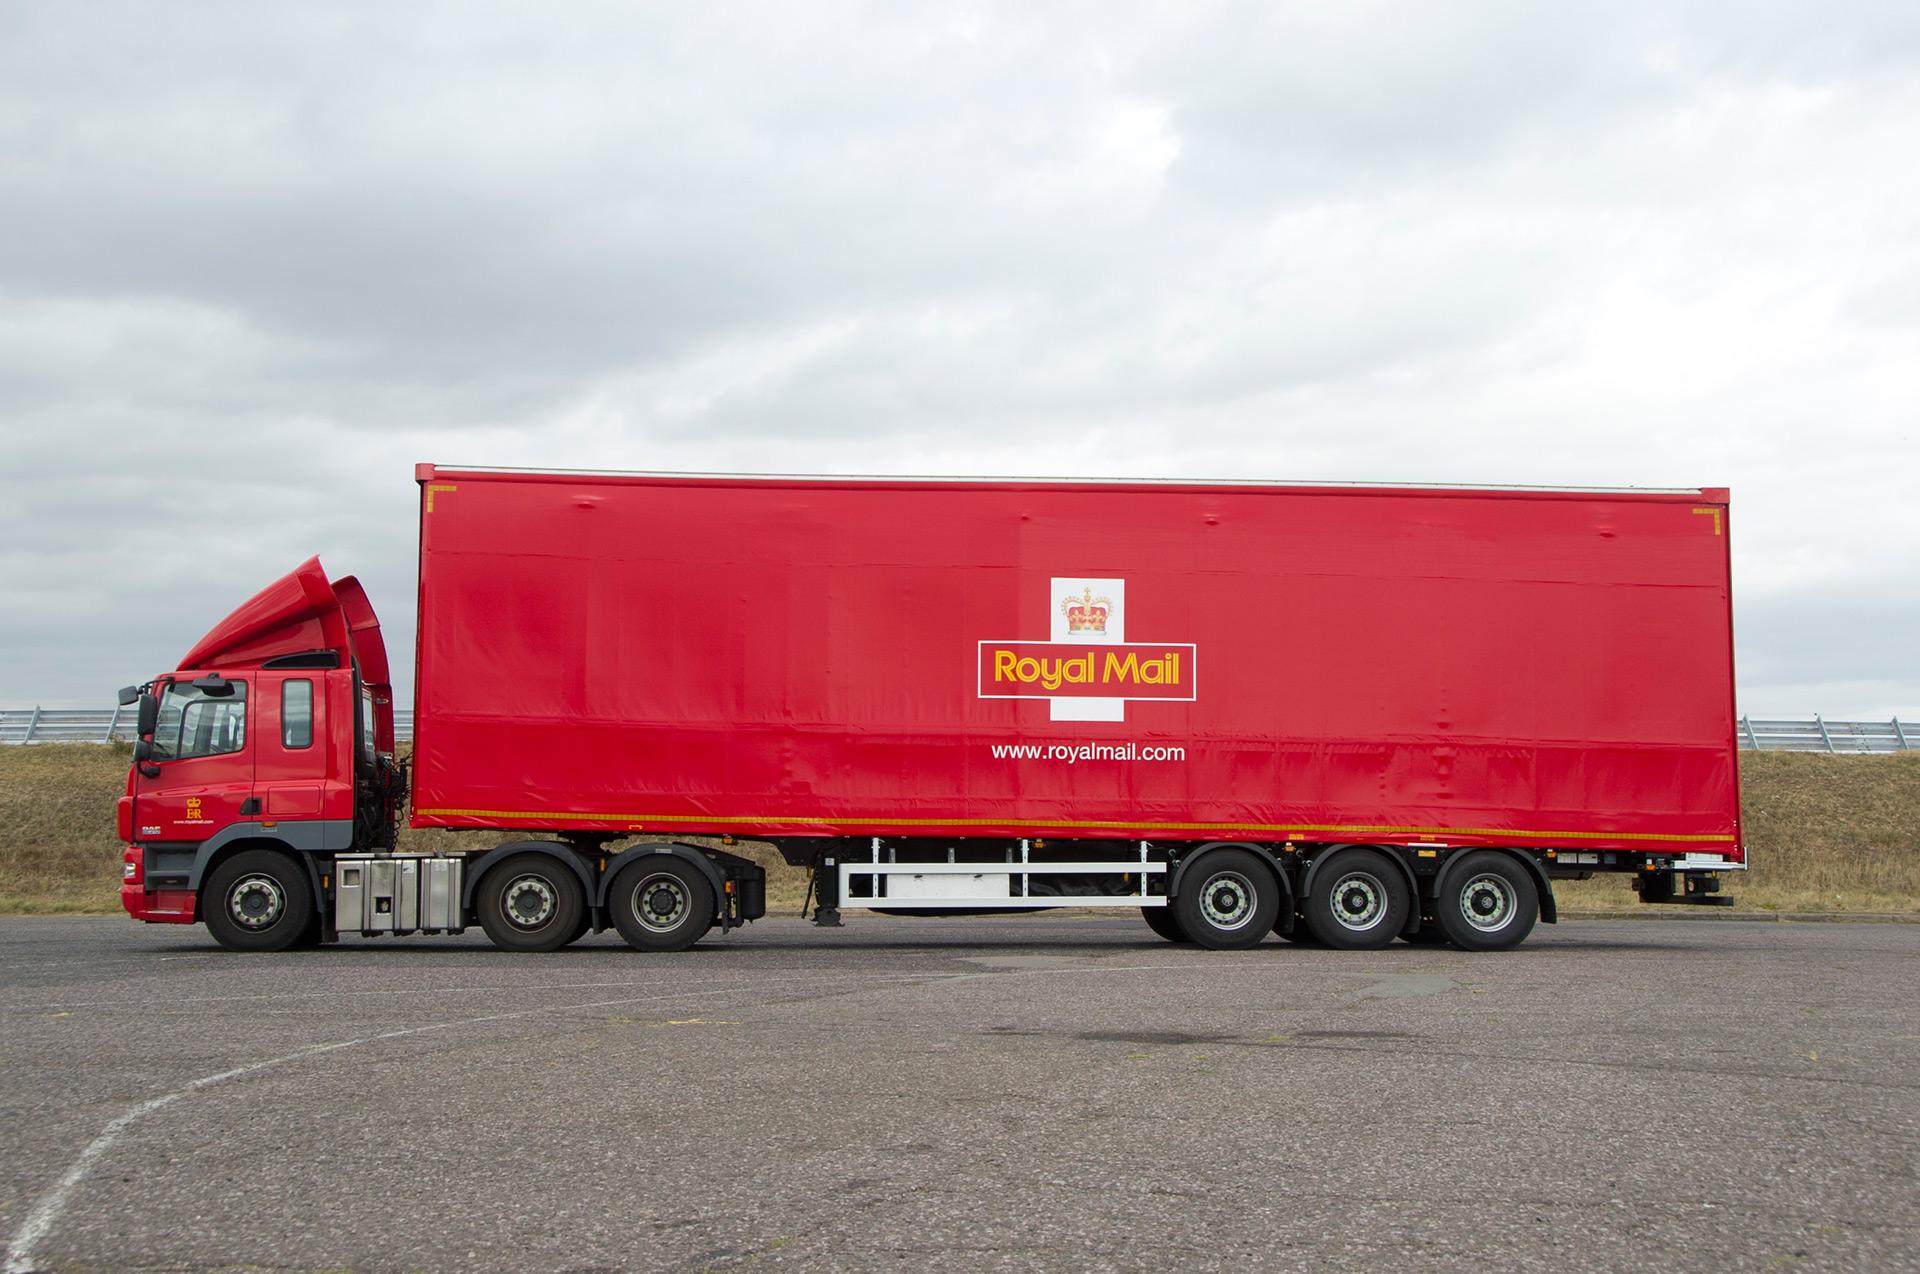 Royal Mail 'Wedge' Lifting Deck